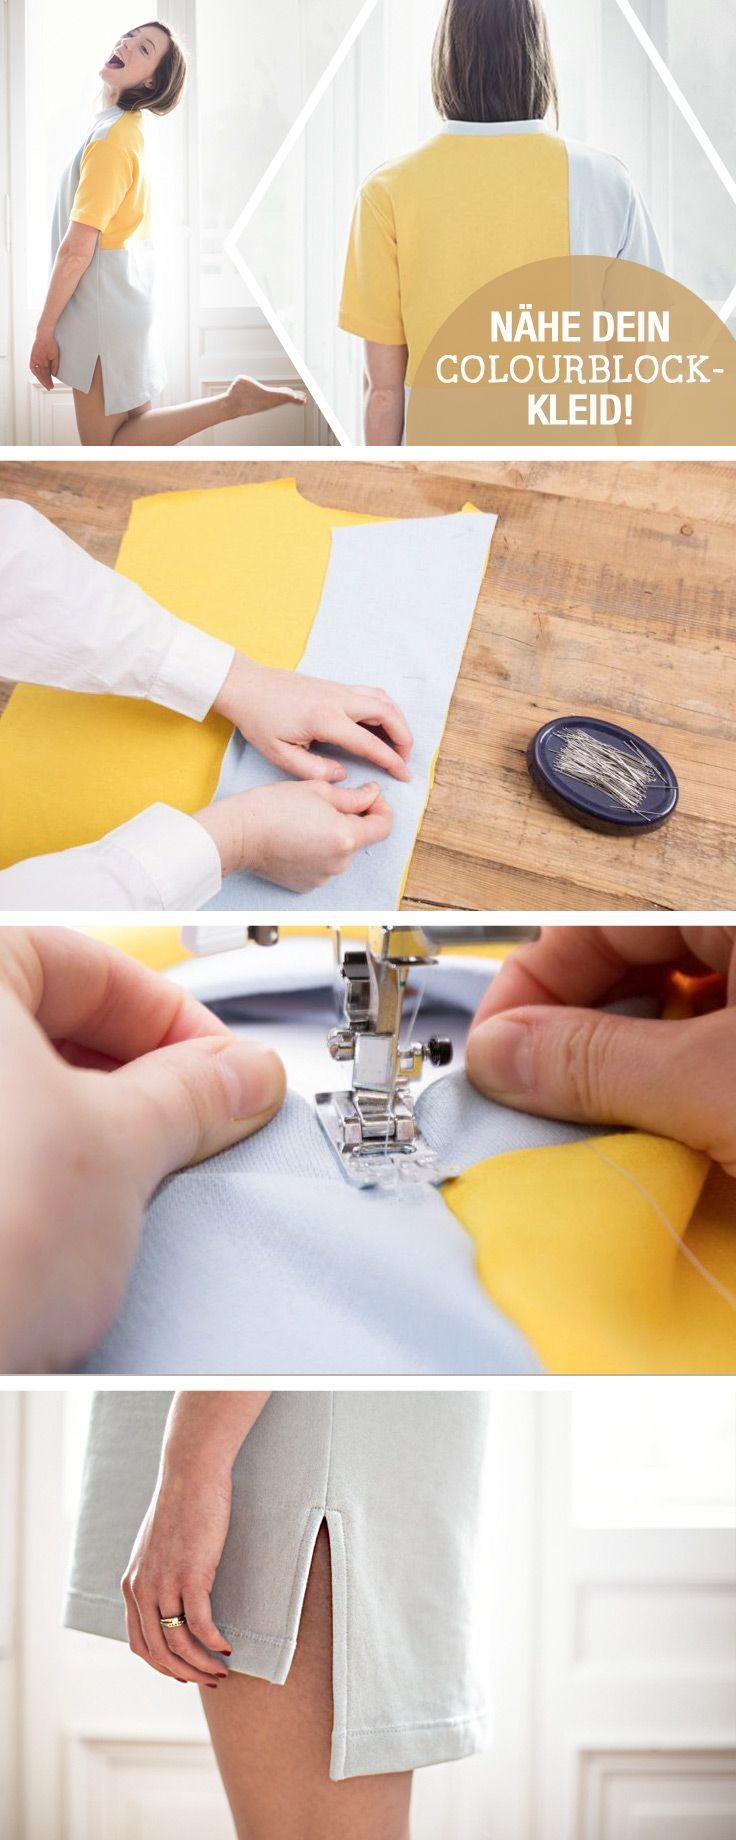 DIY-Anleitung für ein angesagtes T-Shirt Kleid im Colourblocking Stil, lässiger Schnitt / diy sewing tutorial: sew your own casual dress, summer dress via DaWanda.com